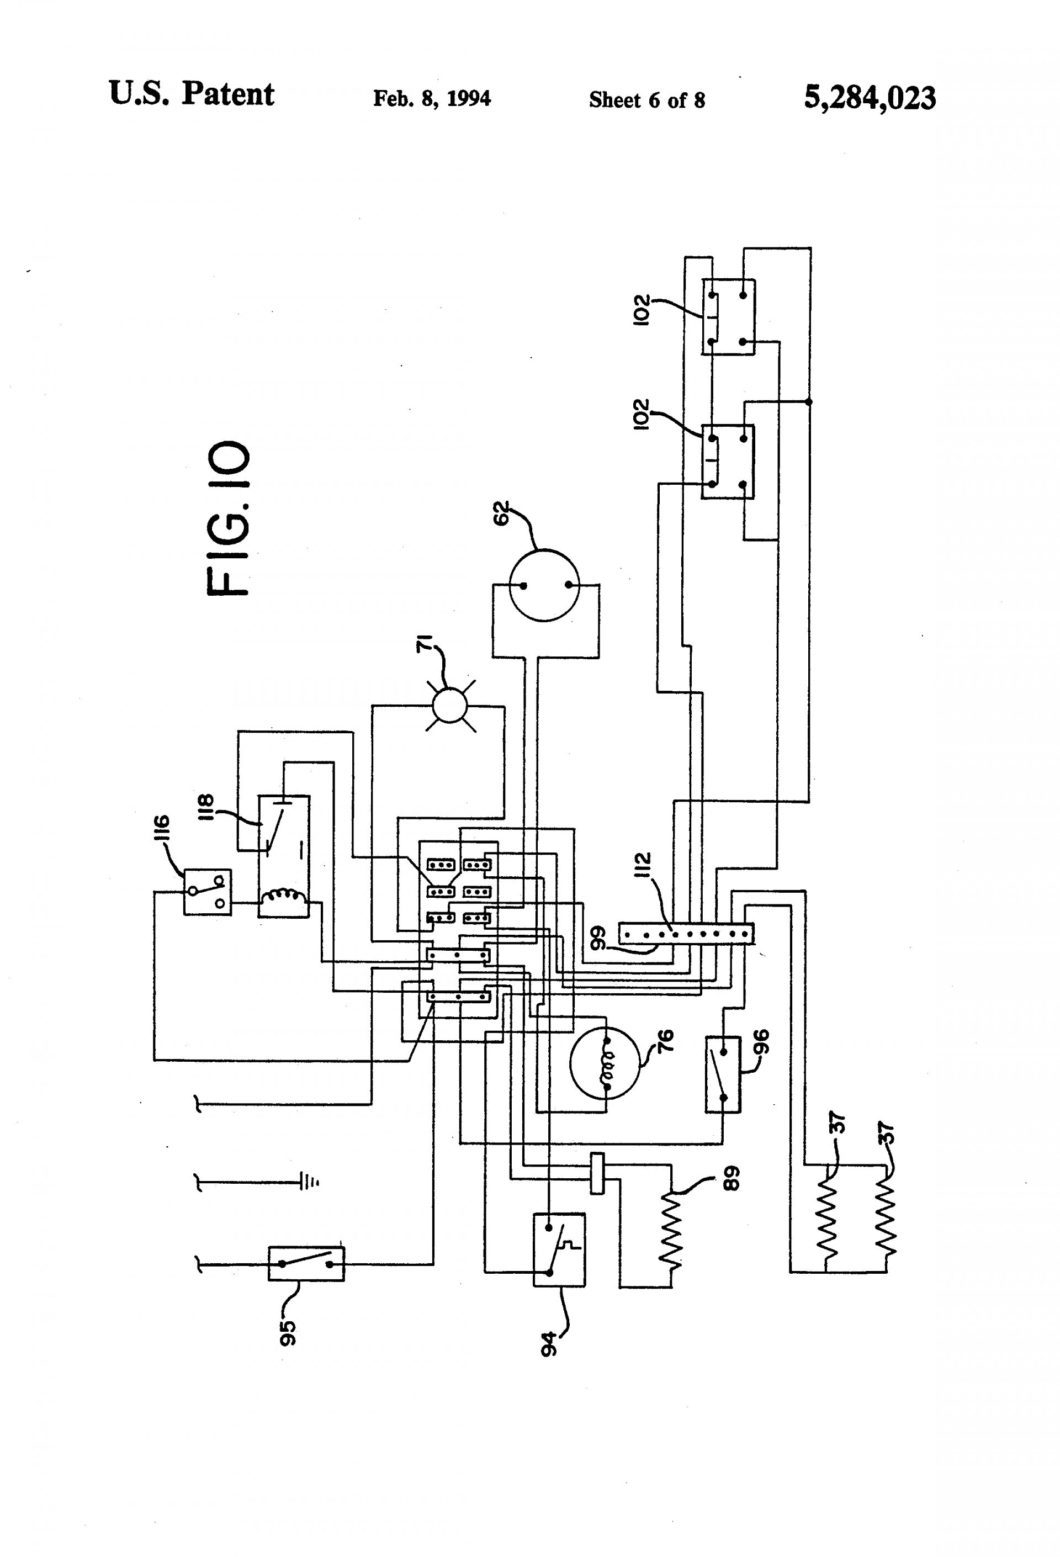 sc_9443] wiring diagram for swamp cooler wiring diagram mastercool evaporative cooler wiring diagram water air cooler wiring diagram ittab dhjem inama spoat onom mentra mohammedshrine librar wiring 101